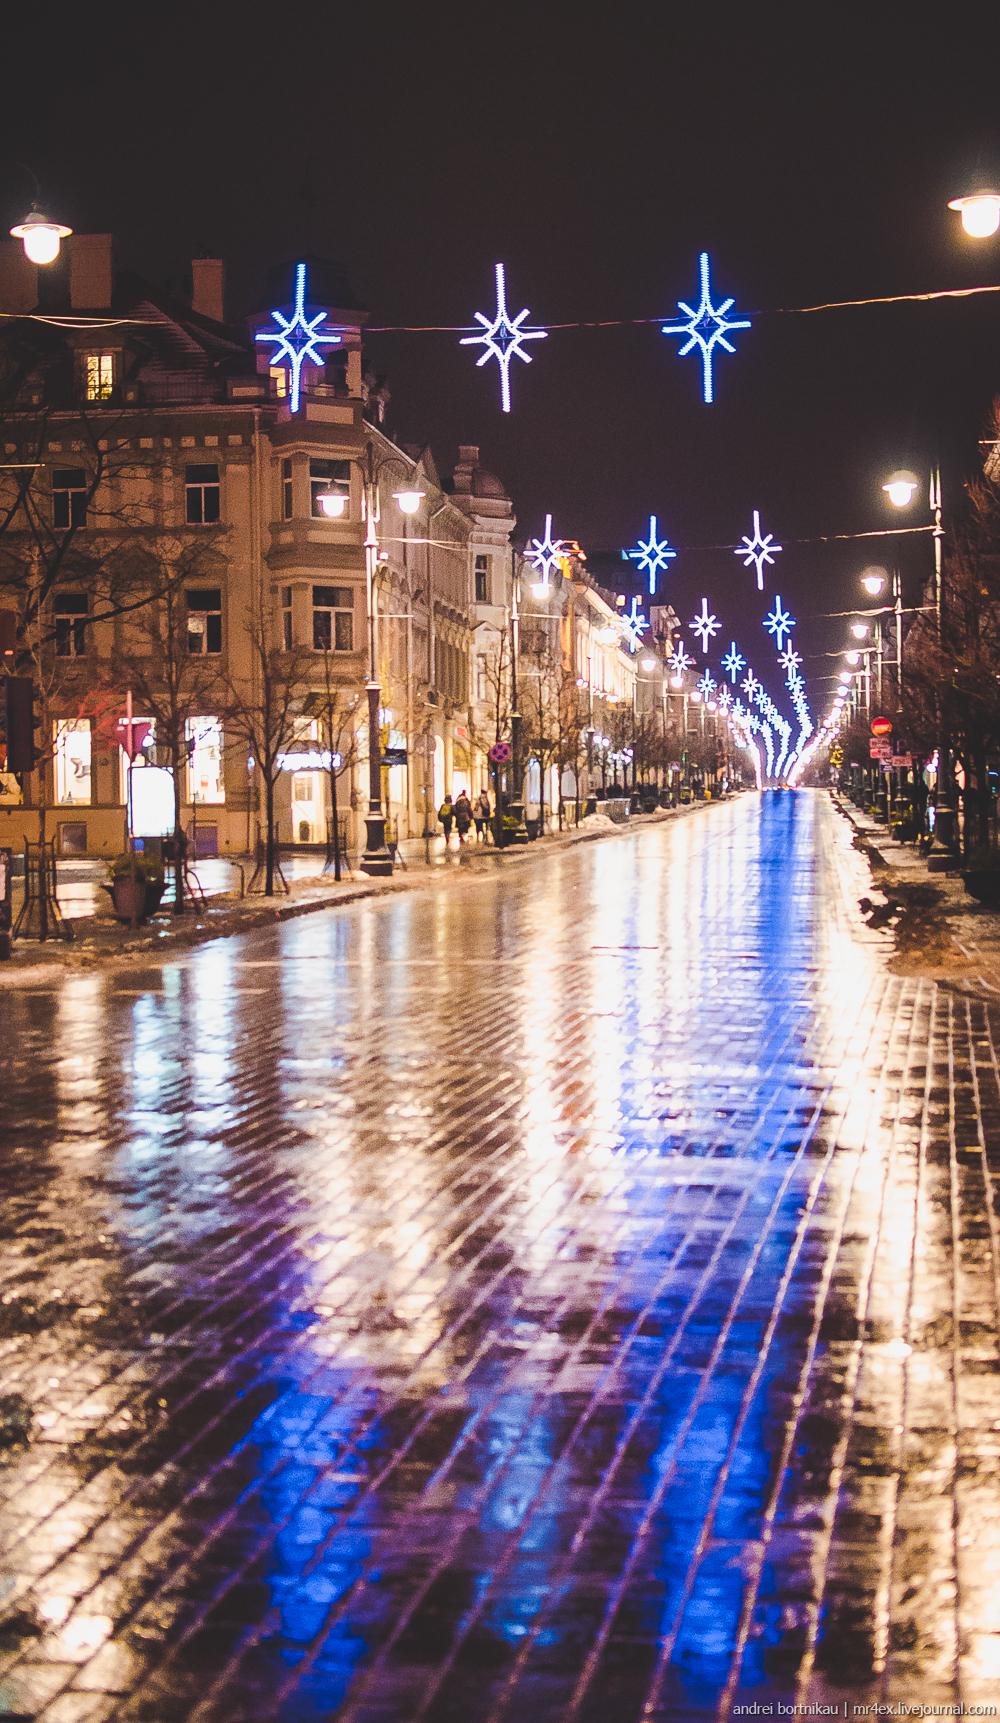 Новогодний Вильнюс, ночной Вильнюс, Литва зимой, Кафедральная площадь Вильнюса